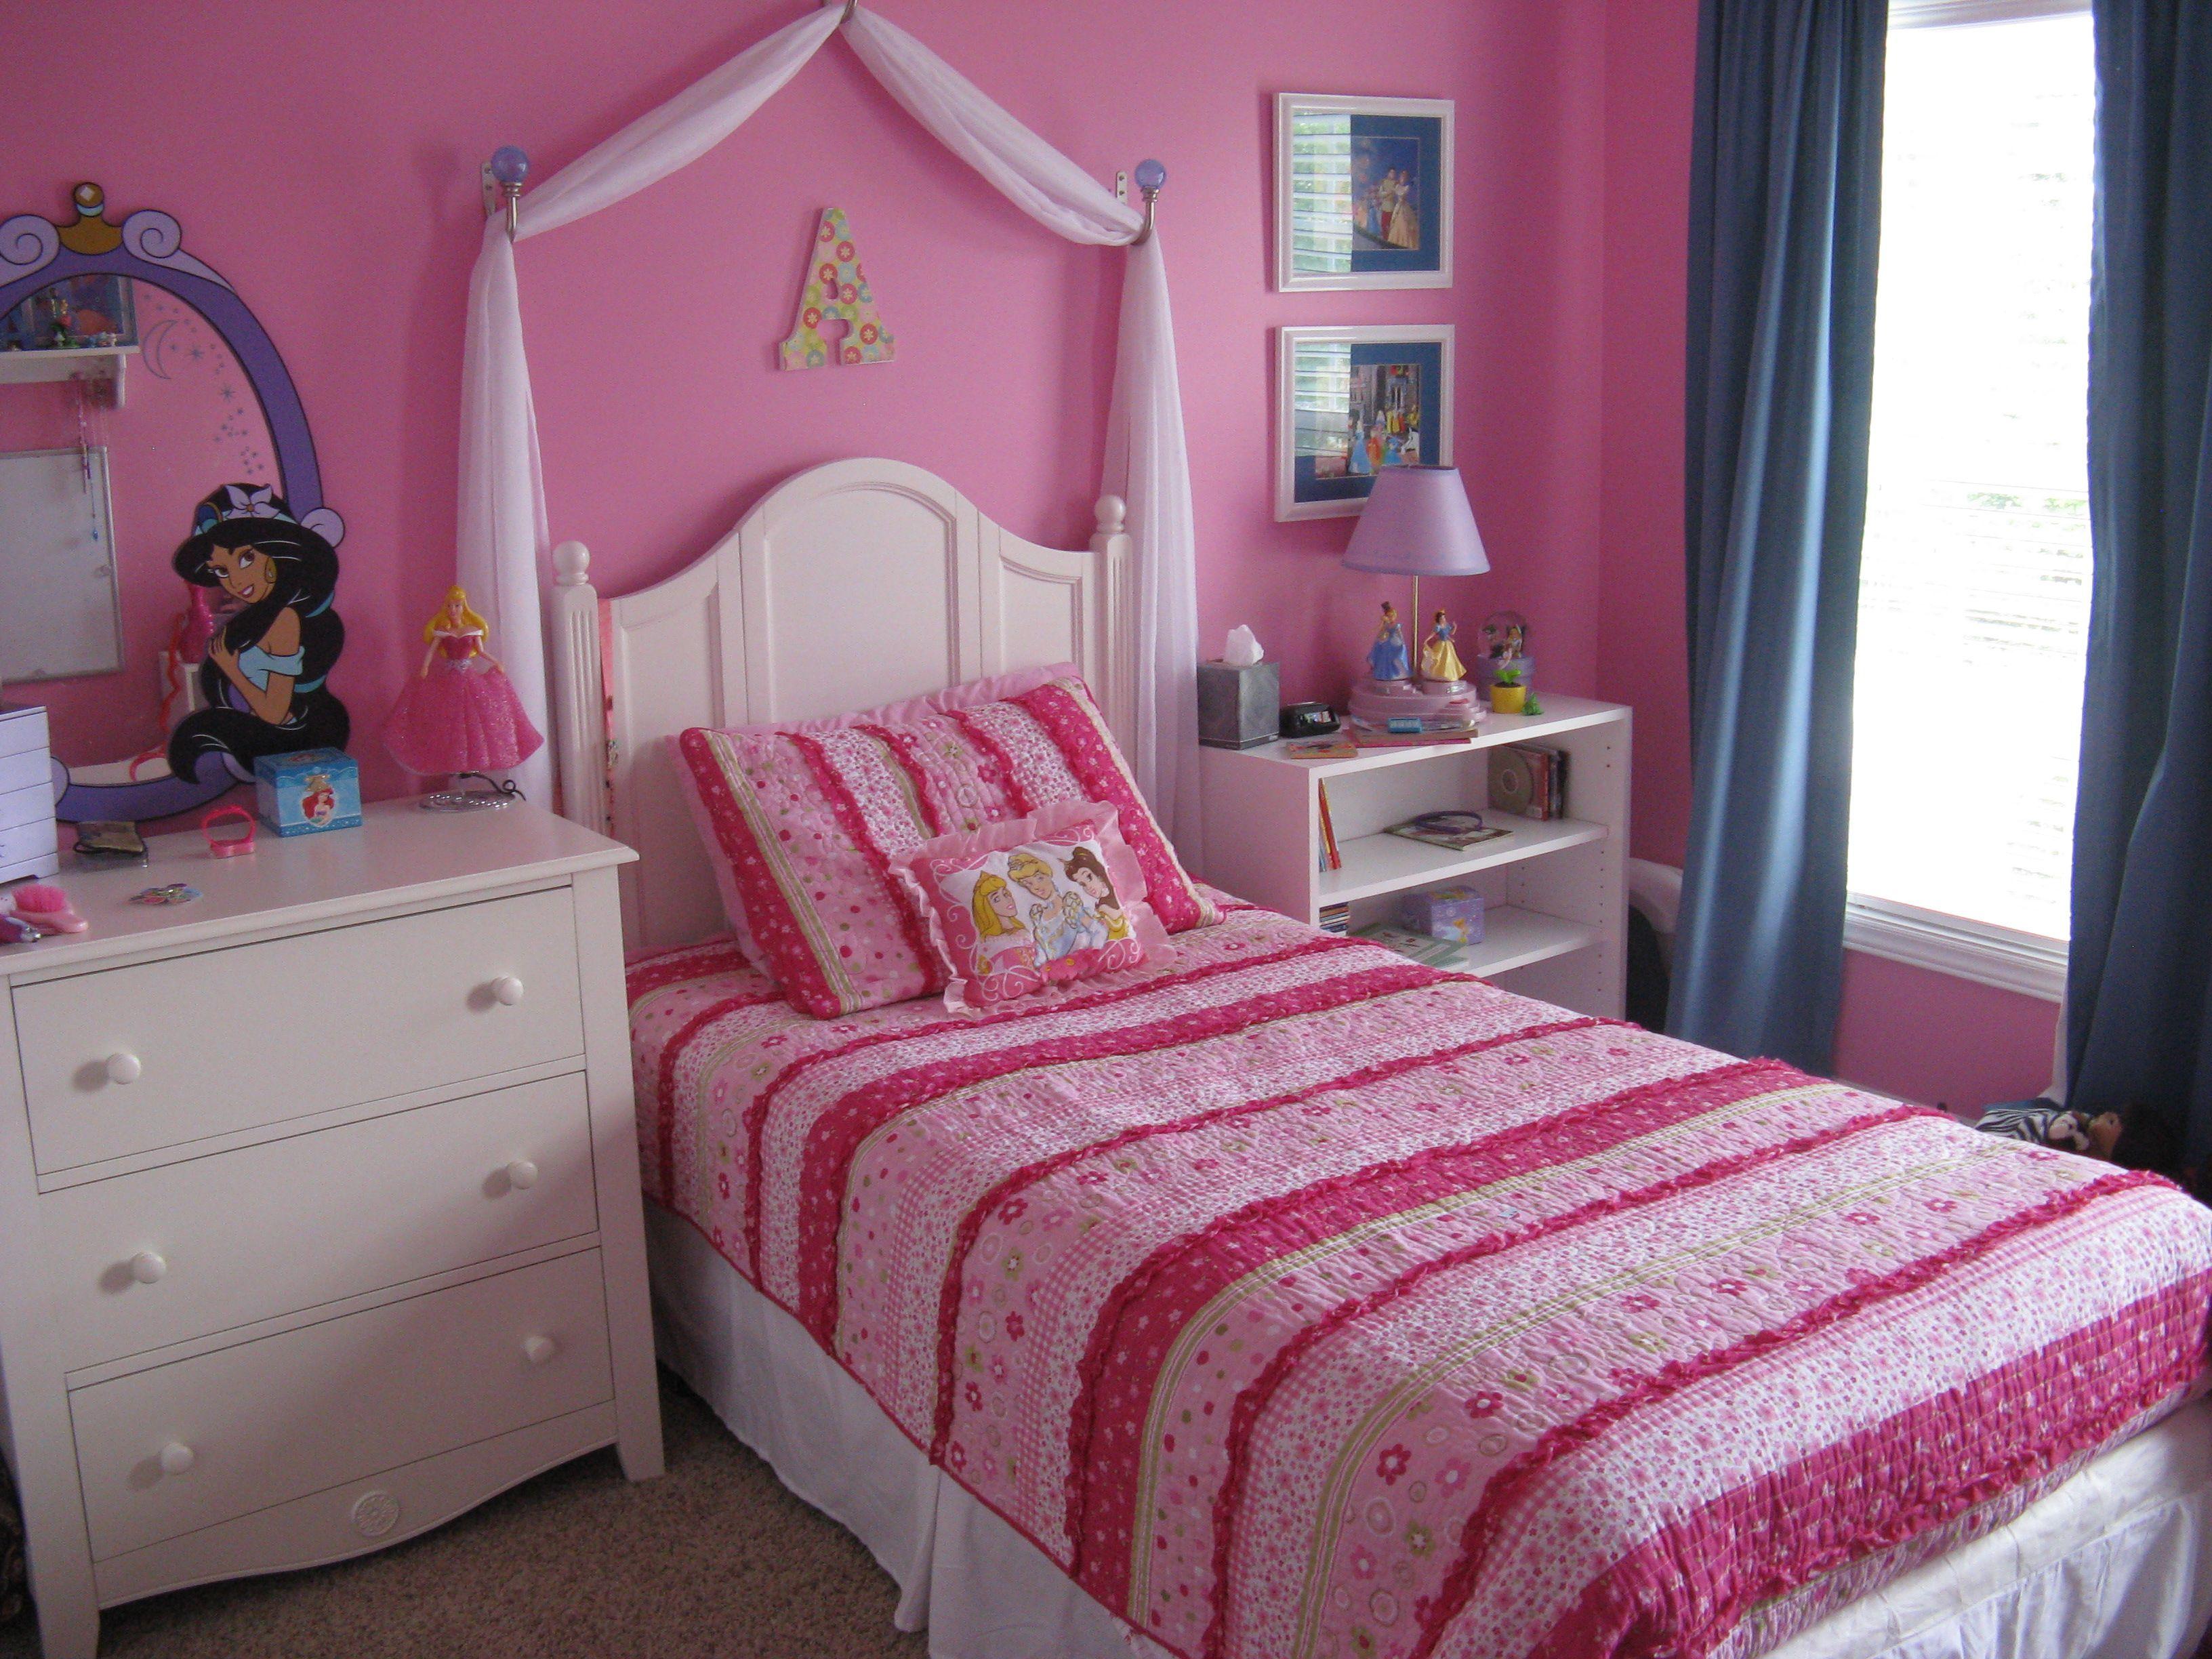 Charming Disney Princess Bedrooms | Decorating A Disney Princess Room On A Budget    Disney Insider Tips